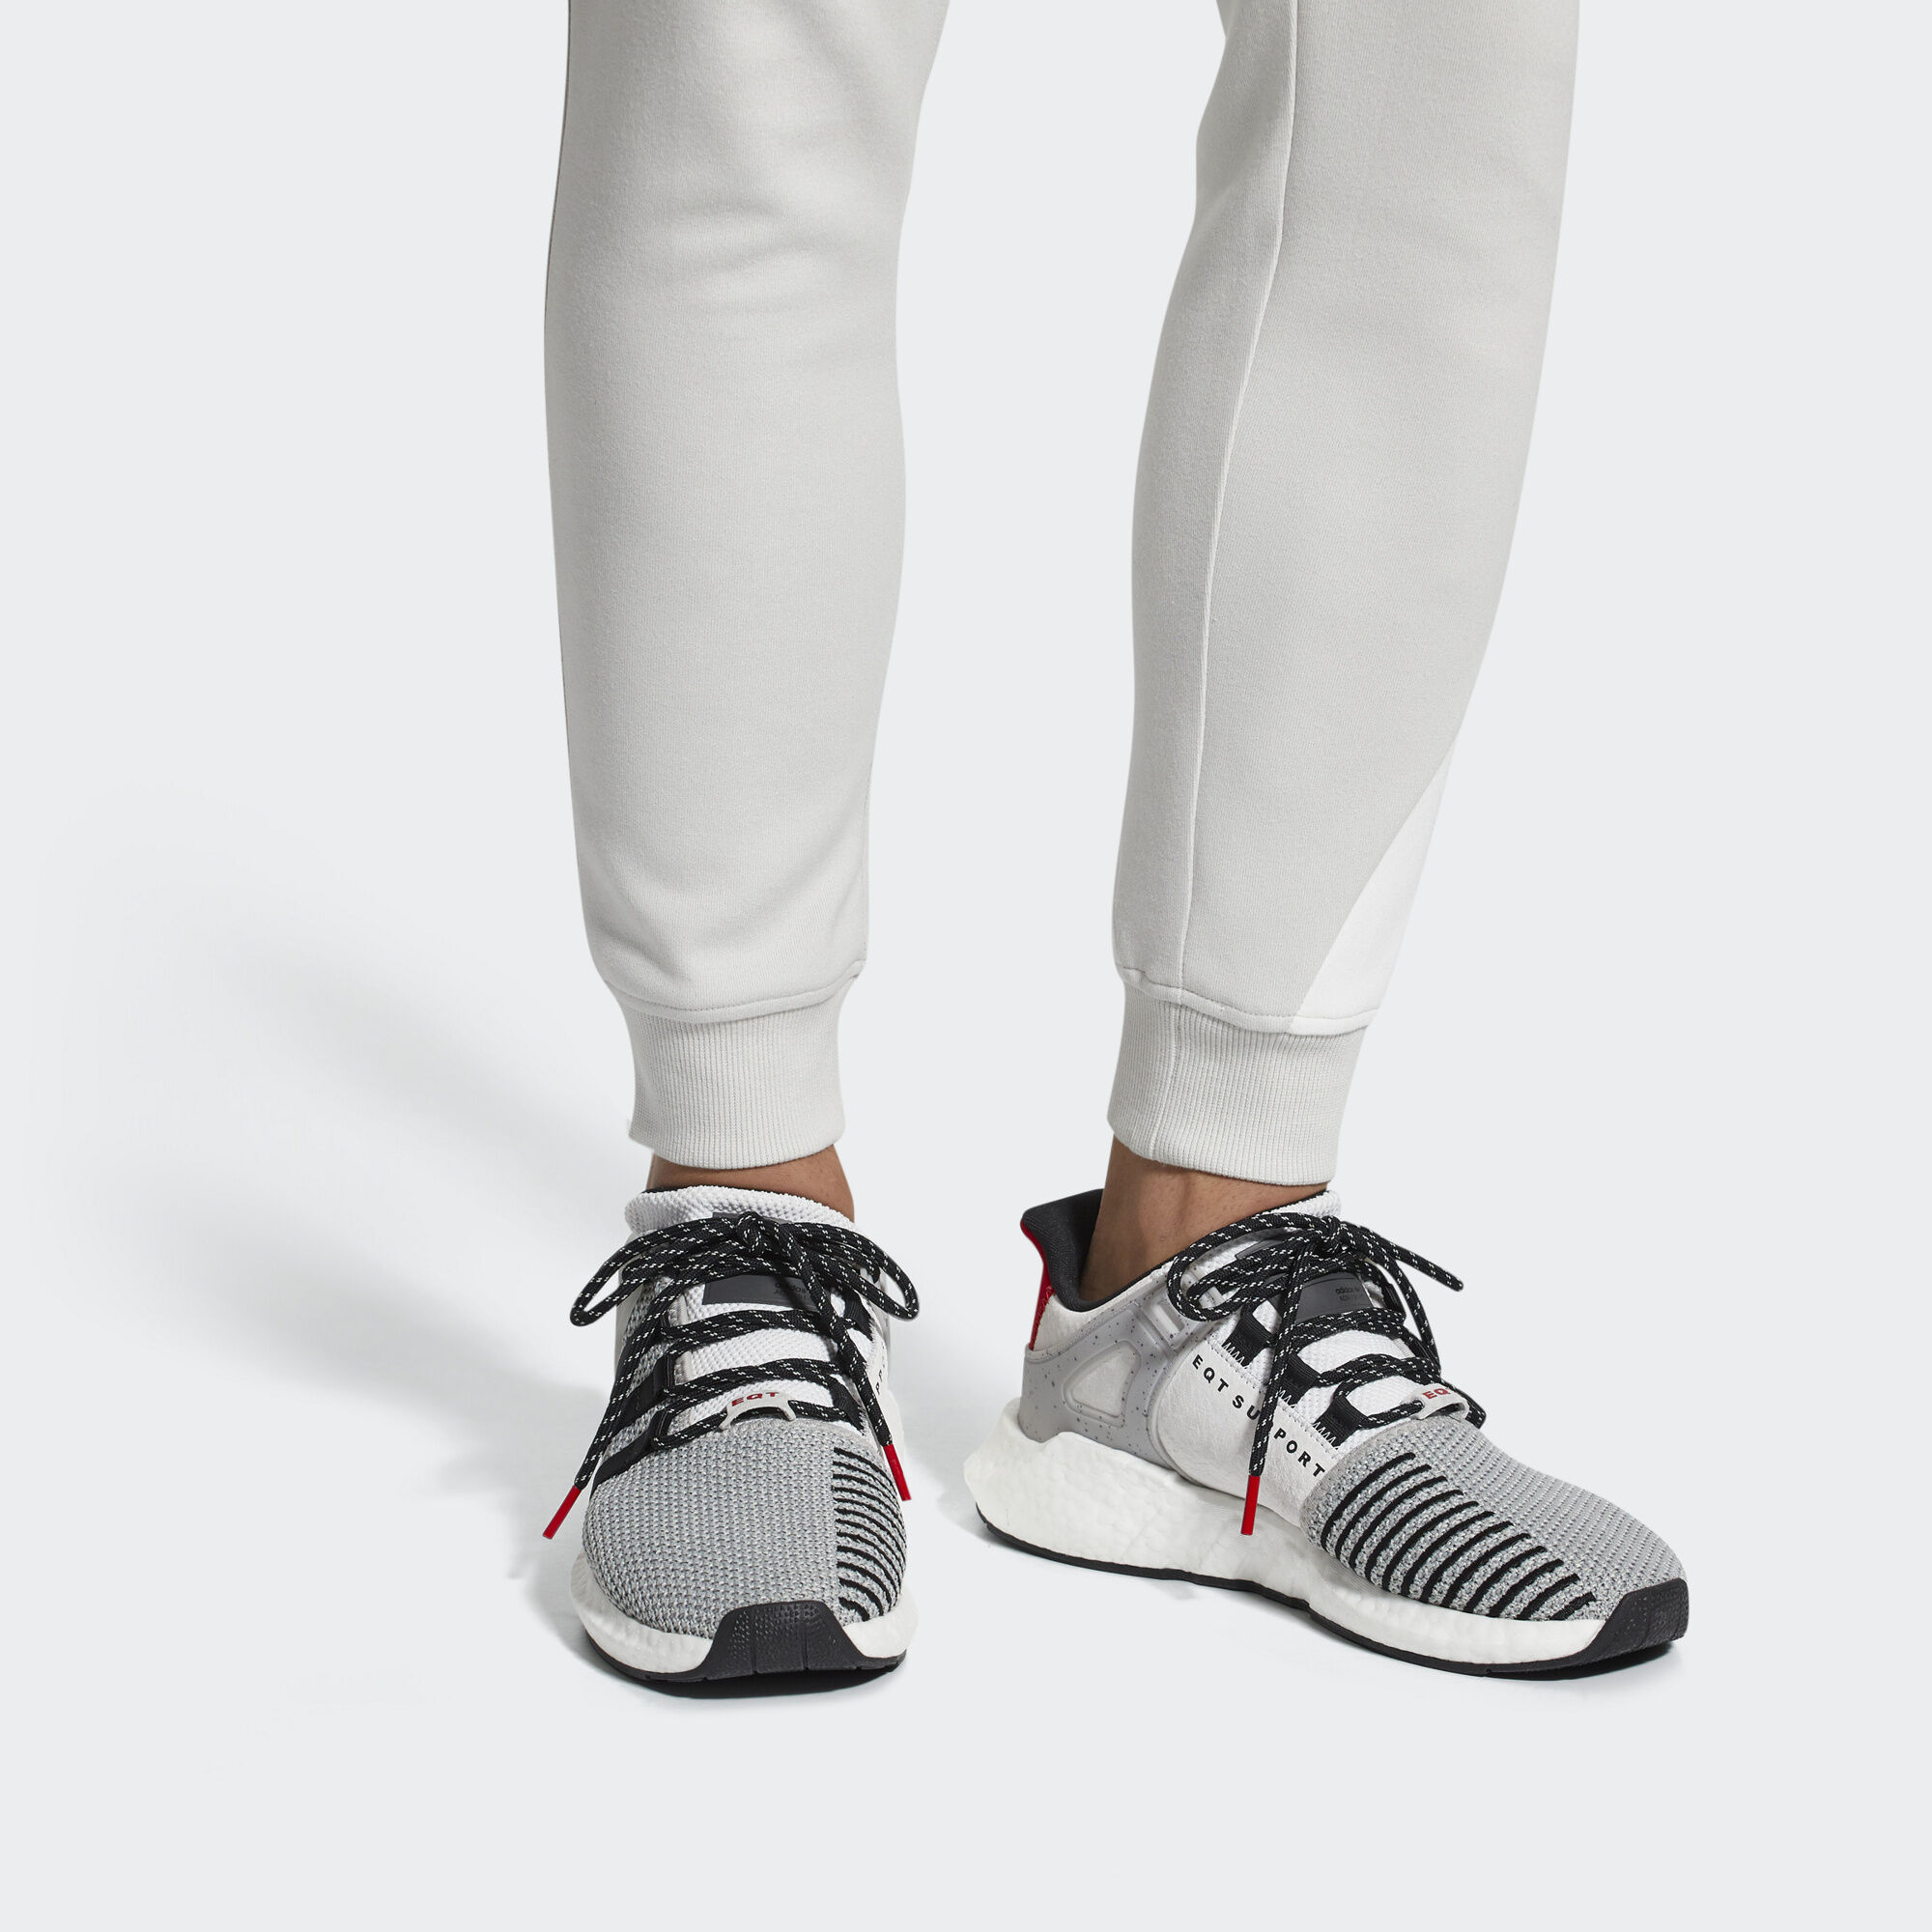 premium selection 136f1 a0d57 Zapatilla EQT Support 9317 - Negro adidas  adidas España